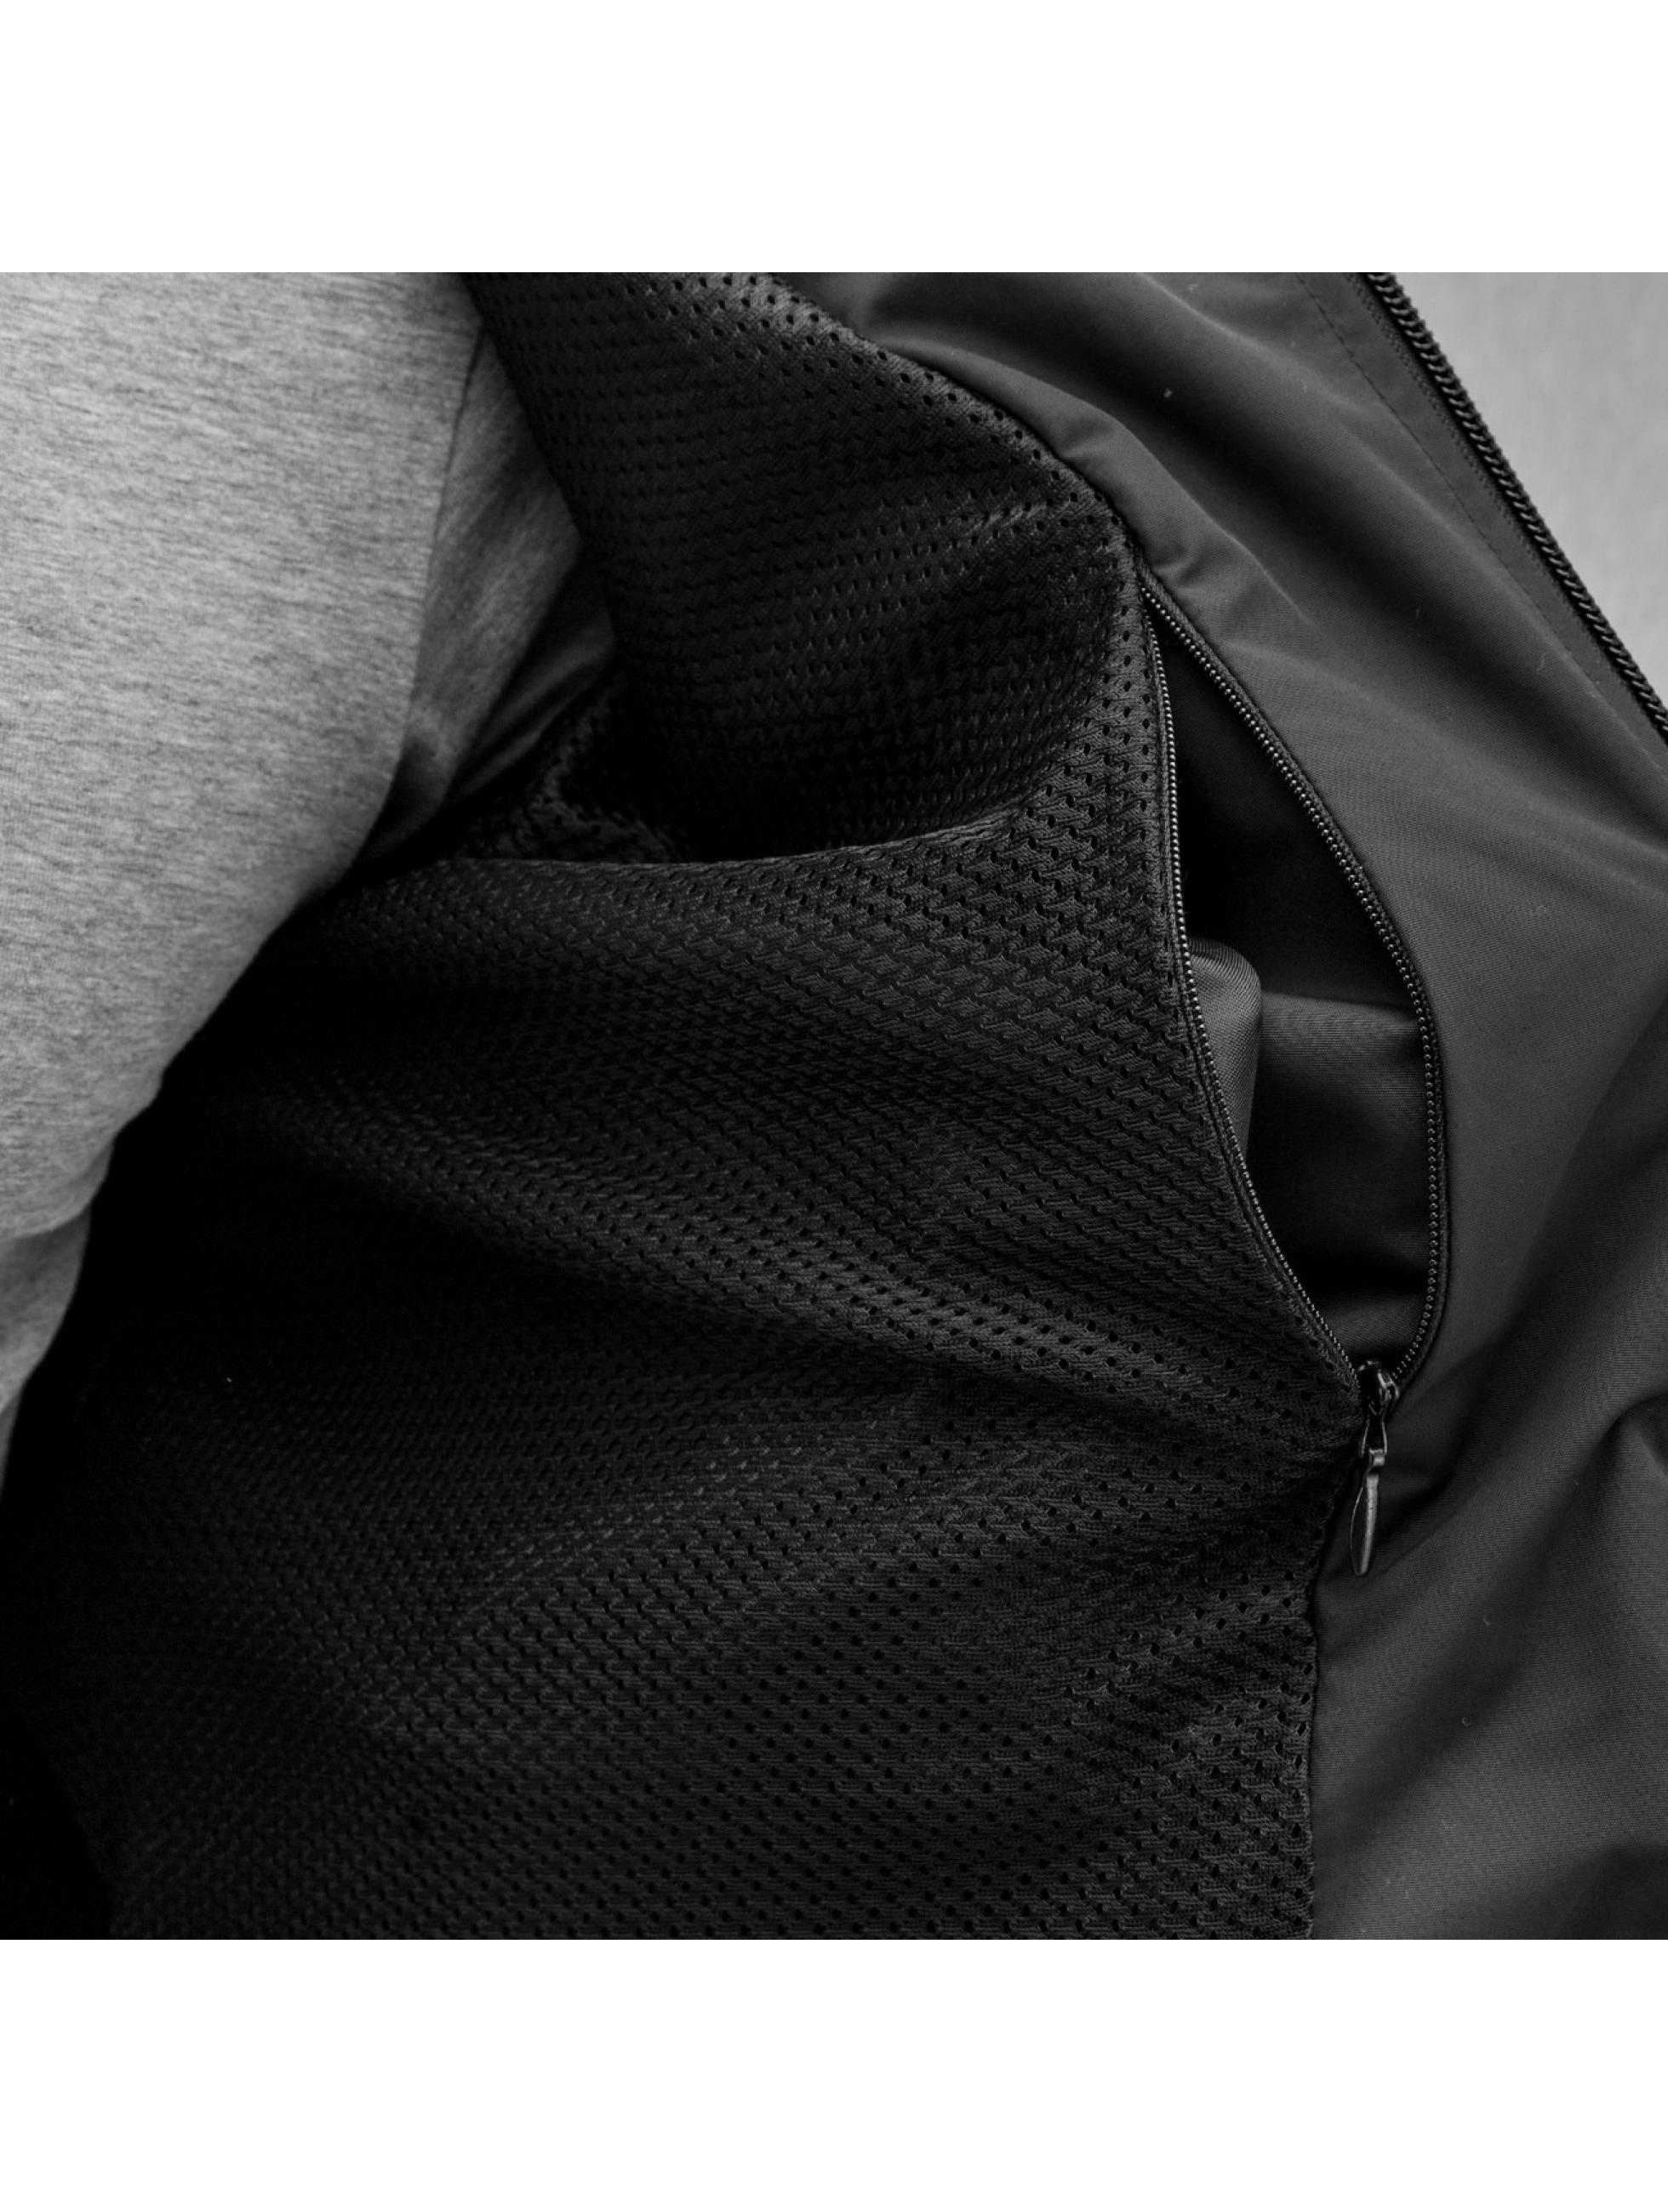 Reell Jeans Куртка-бомбардир Technical черный